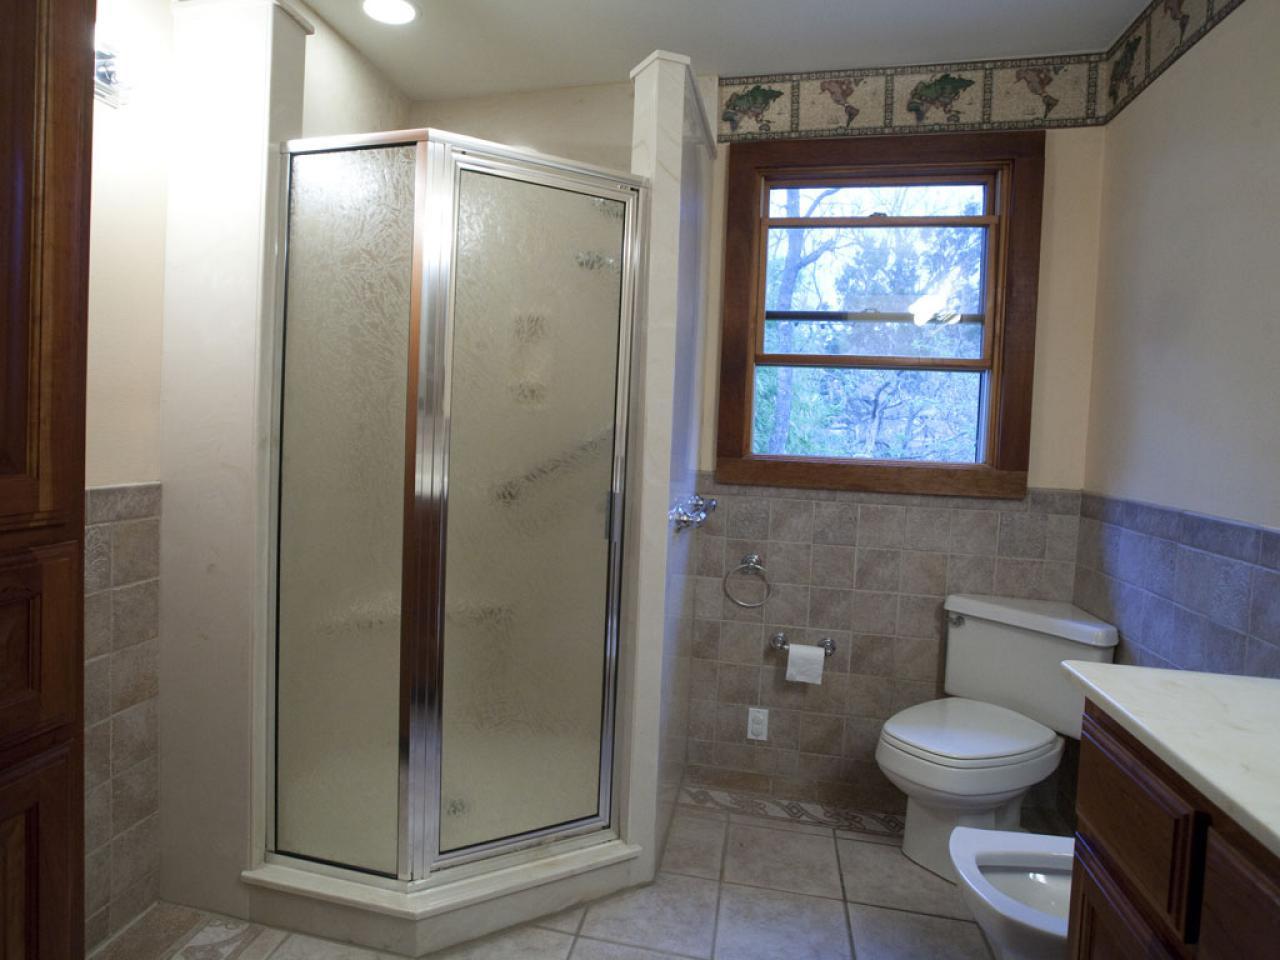 HPBRS409_bathroom-BEFORE_0022_s4x3.jpg.rend.hgtvcom.1280.960